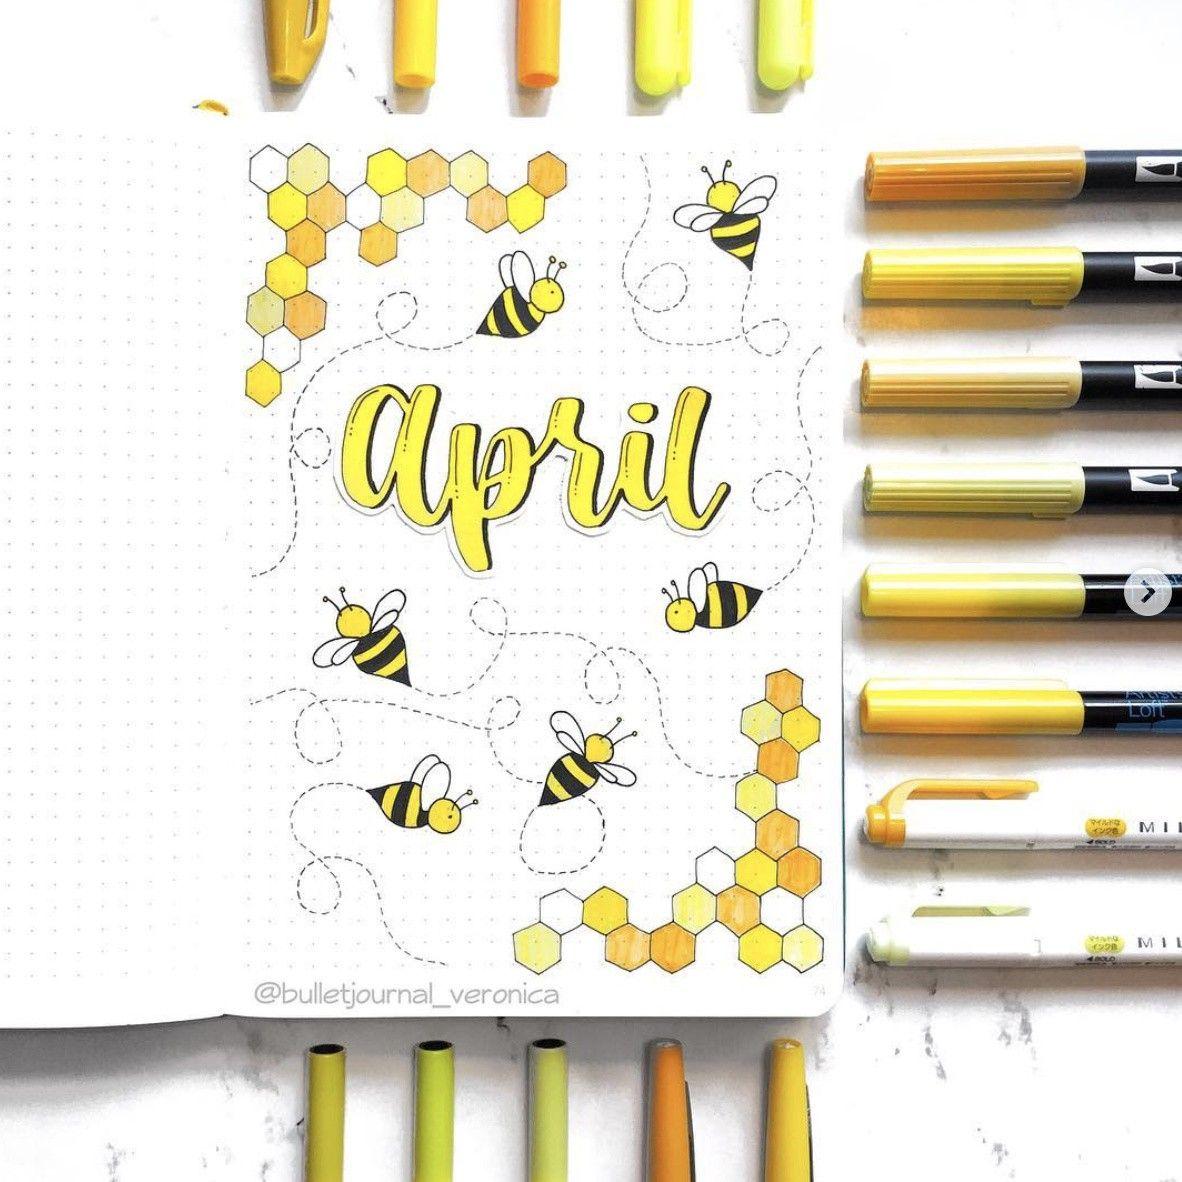 Best April Bullet Journal Ideas that You'll Love - The Smart Wander